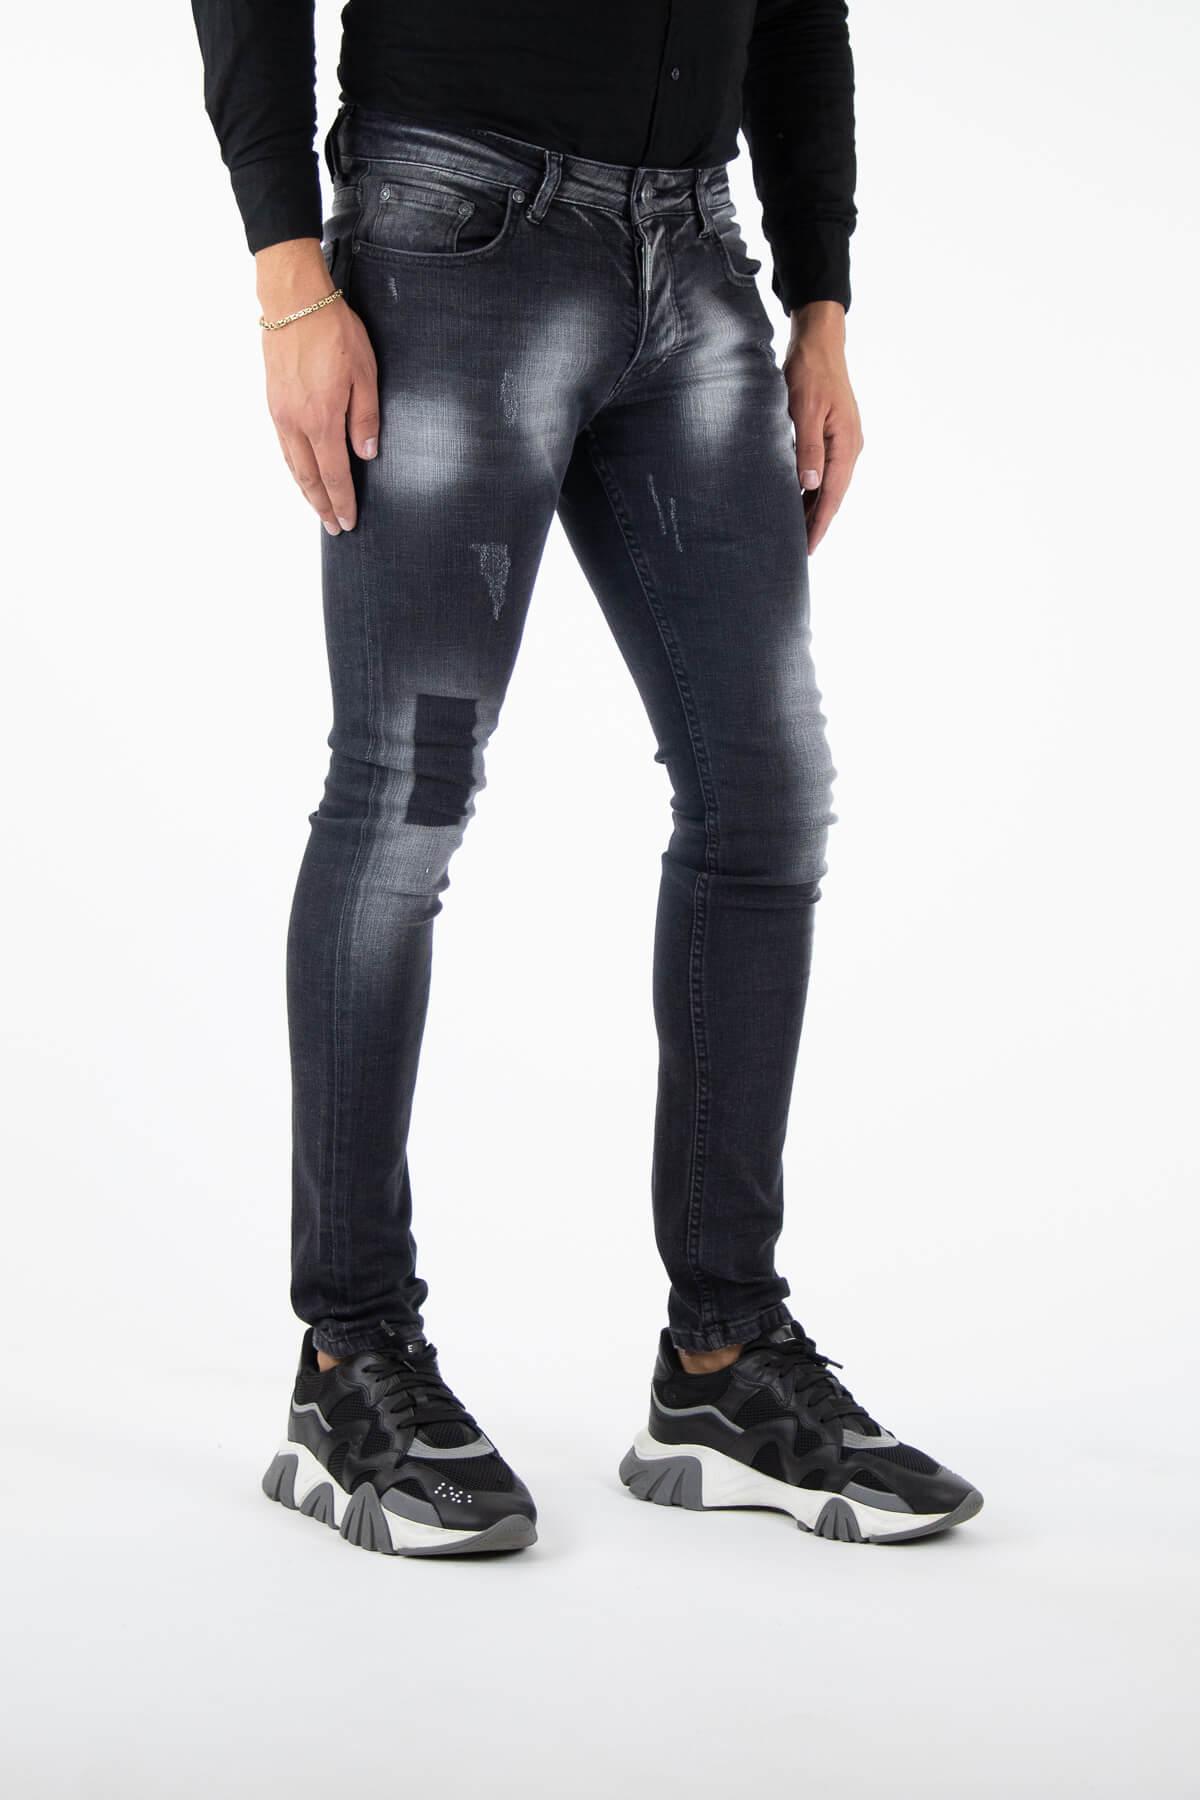 Porto Dark Jeans-2